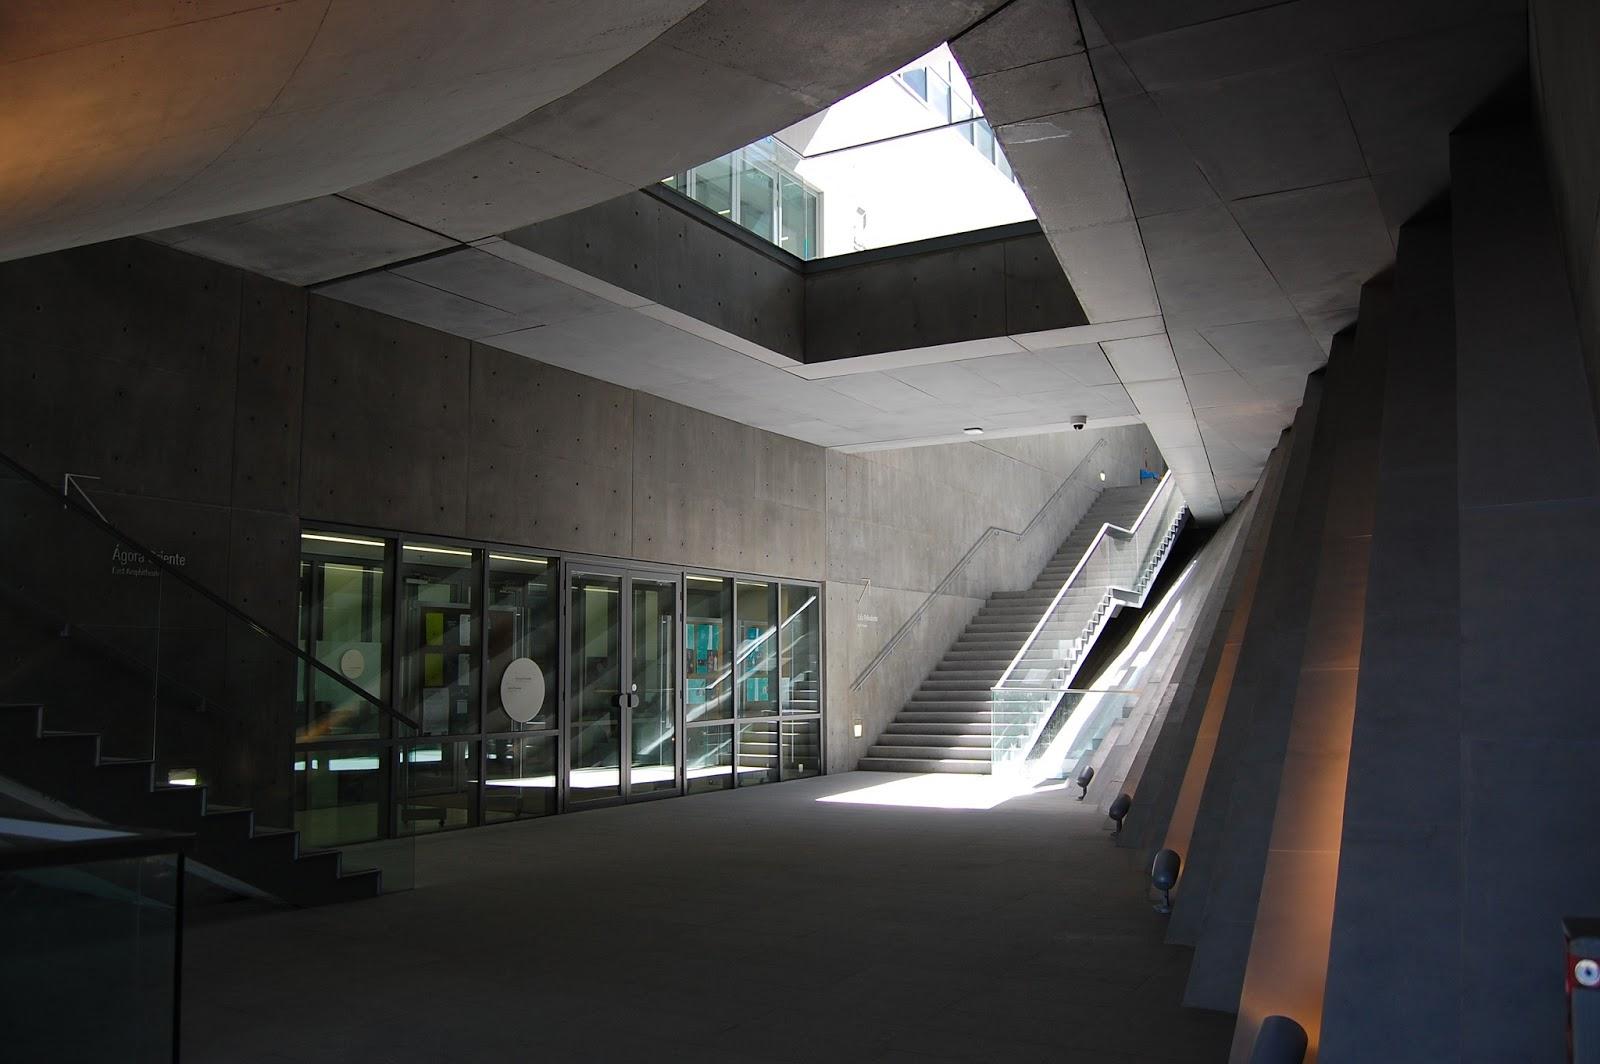 Felicidades udem inauguraci n crgs for Arquitectura y diseno monterrey